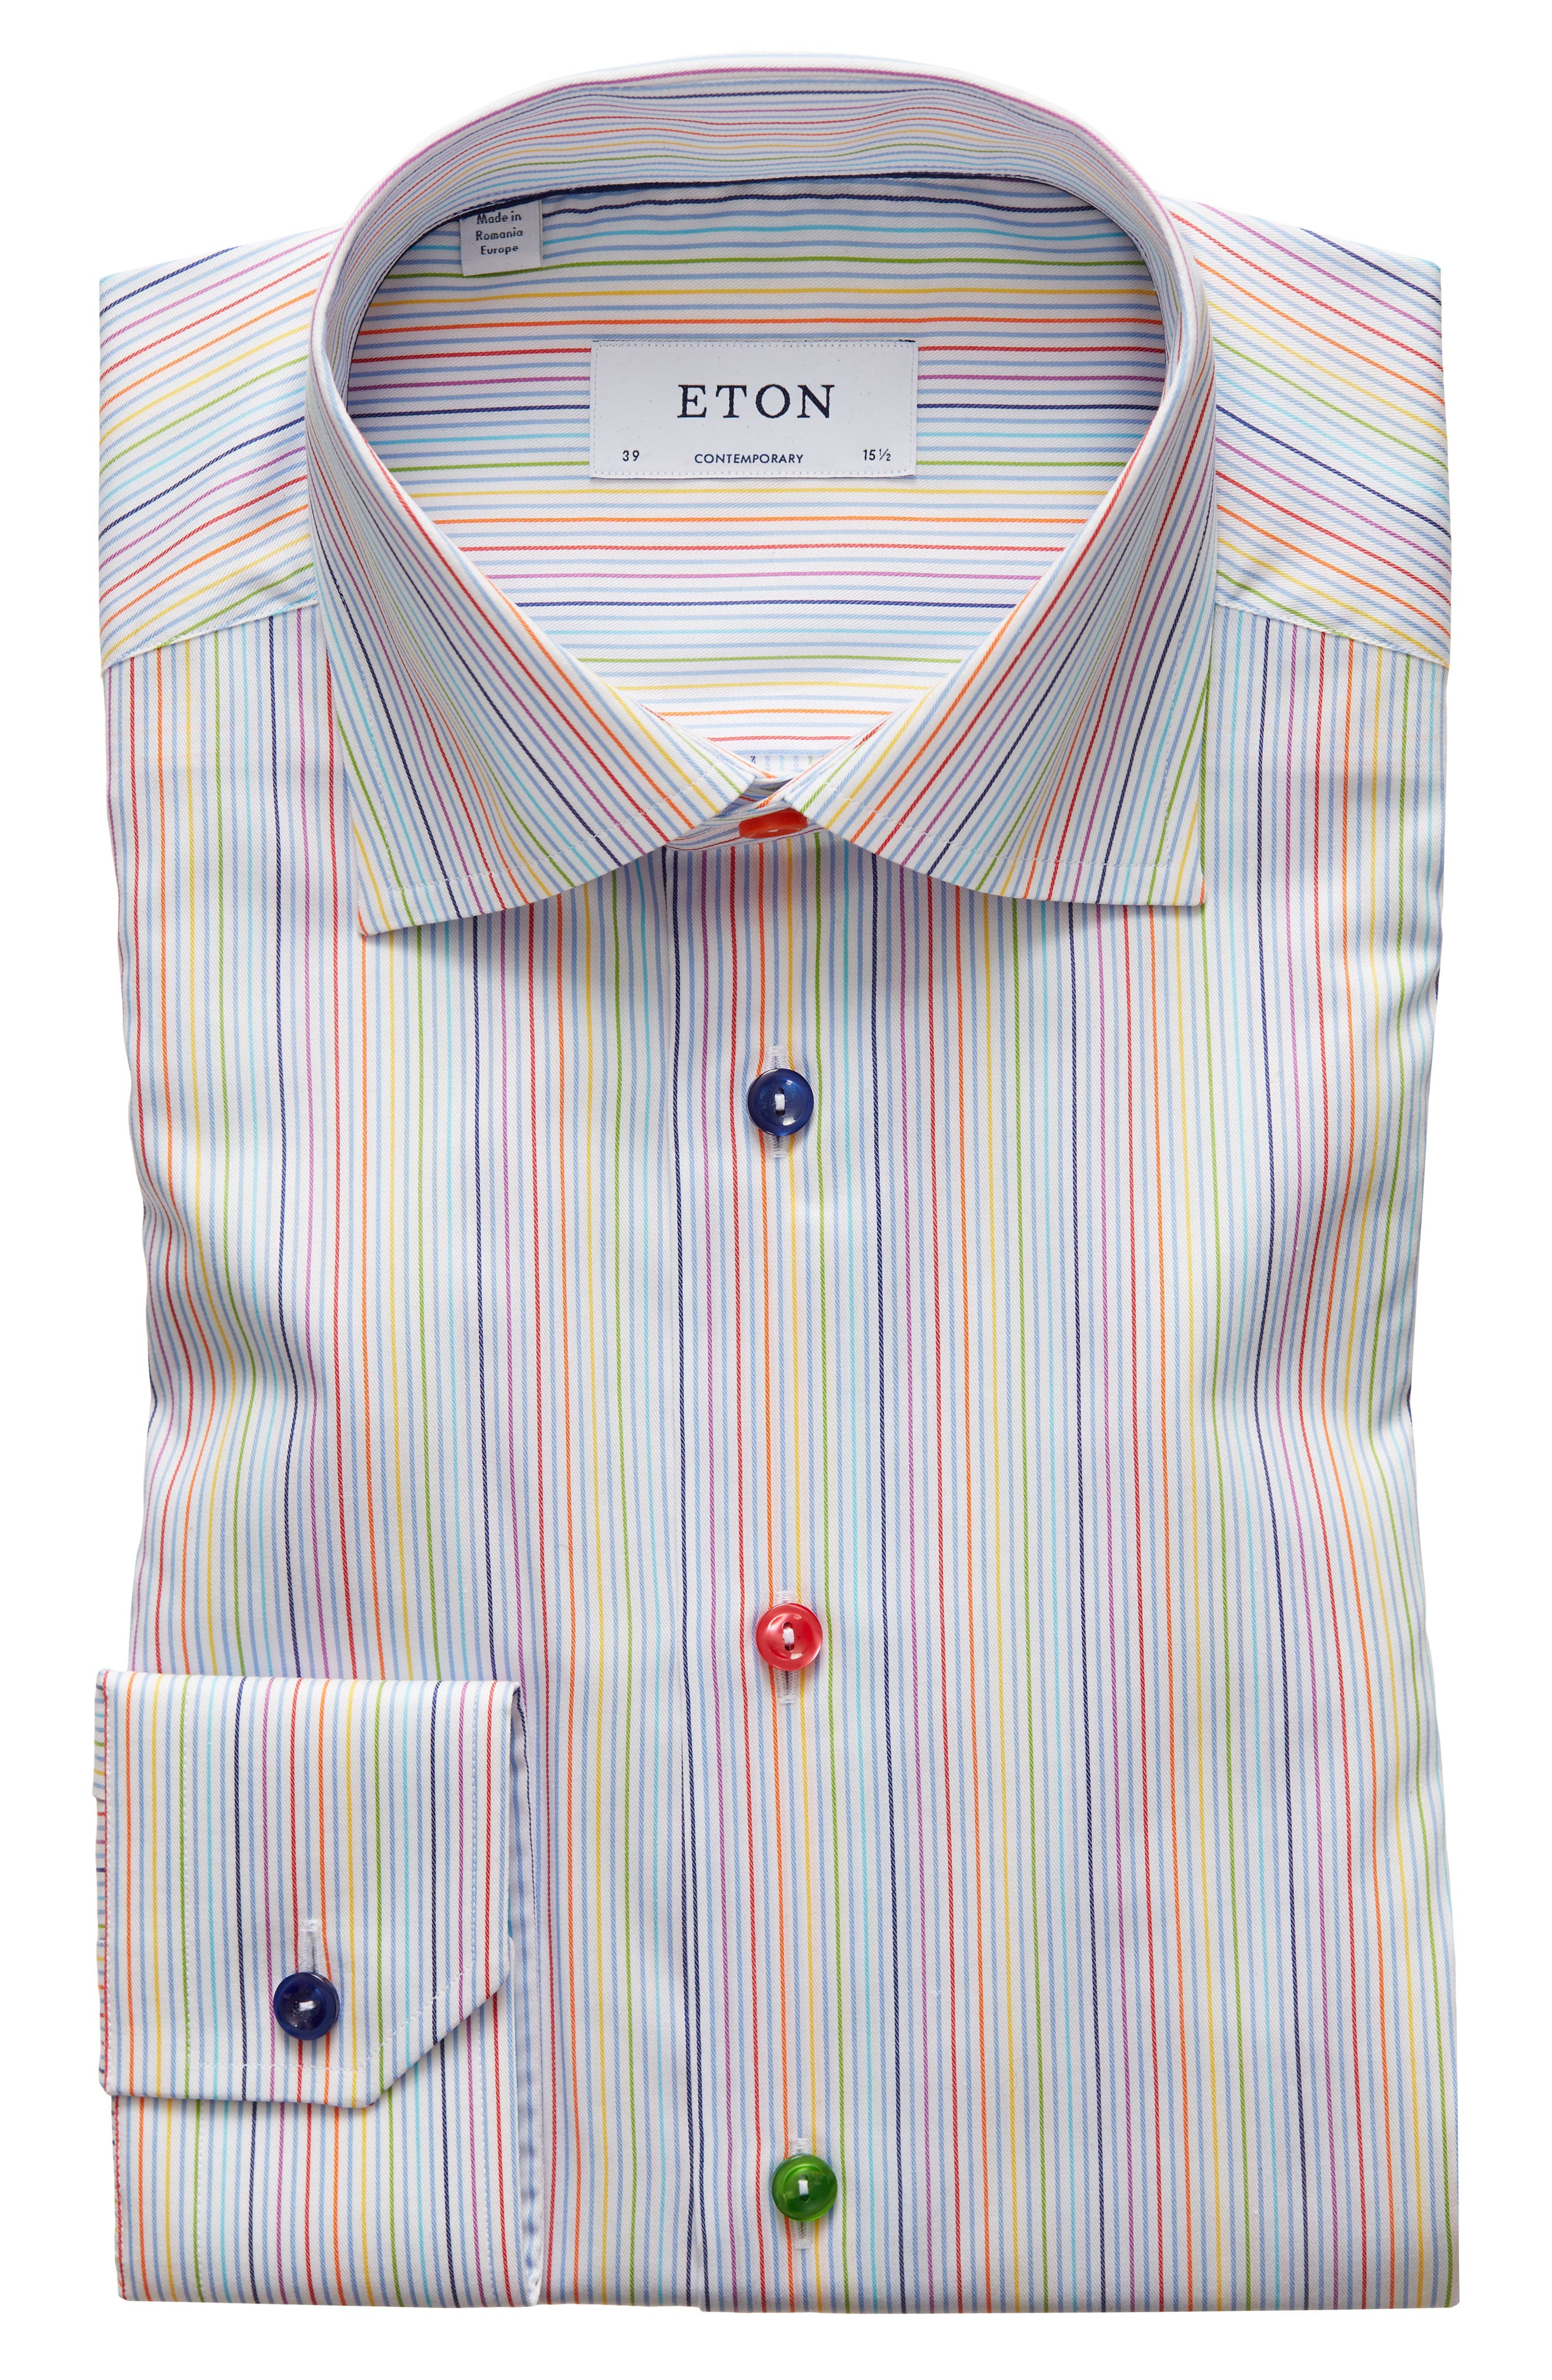 Eton Mens Contemporary Fit Stripe Shirt